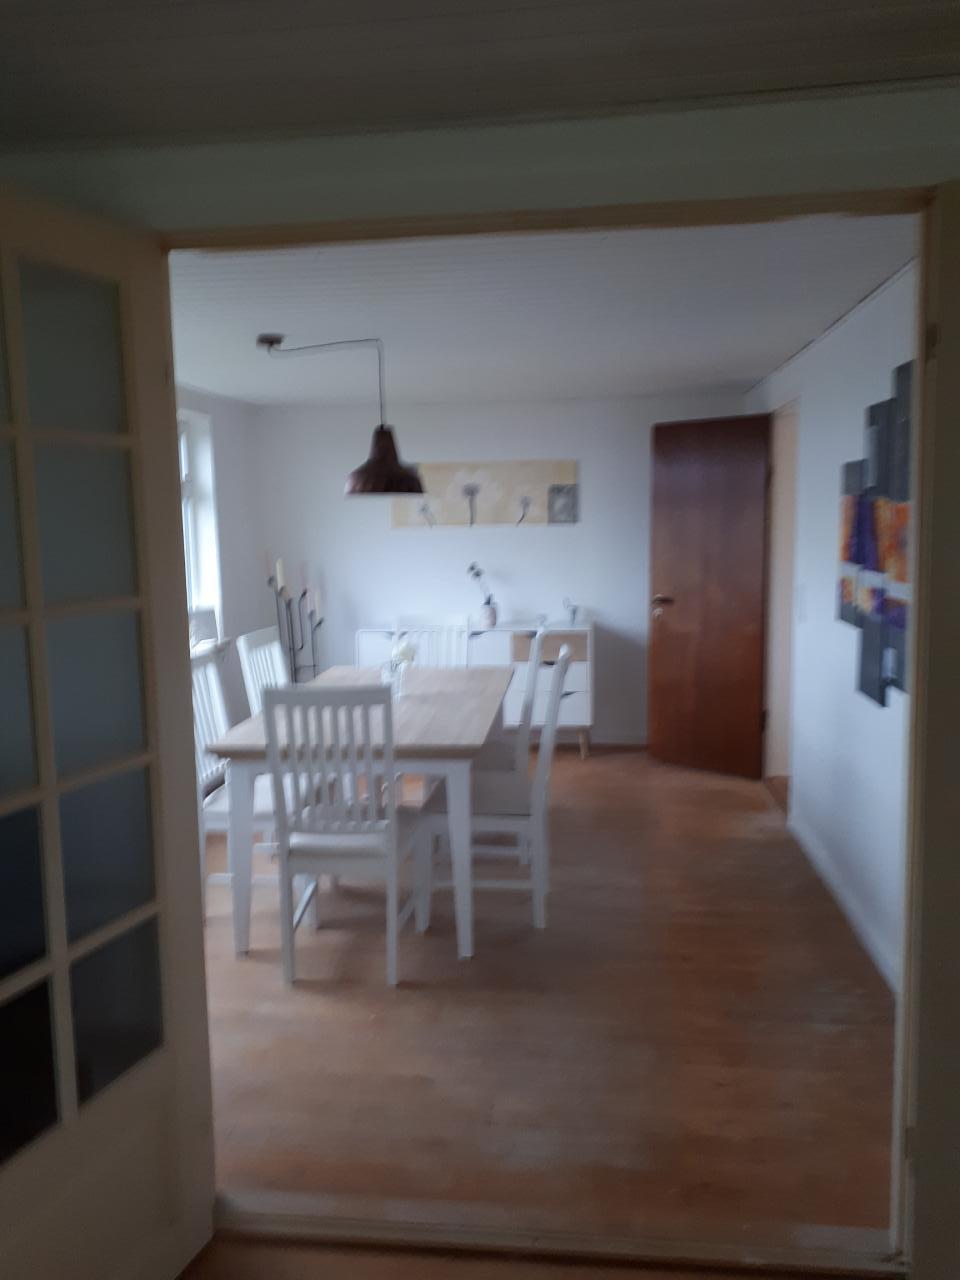 Ferienhaus Tklhus Aeroe (2549744), Ærøskøbing, , Ærø, Dänemark, Bild 6